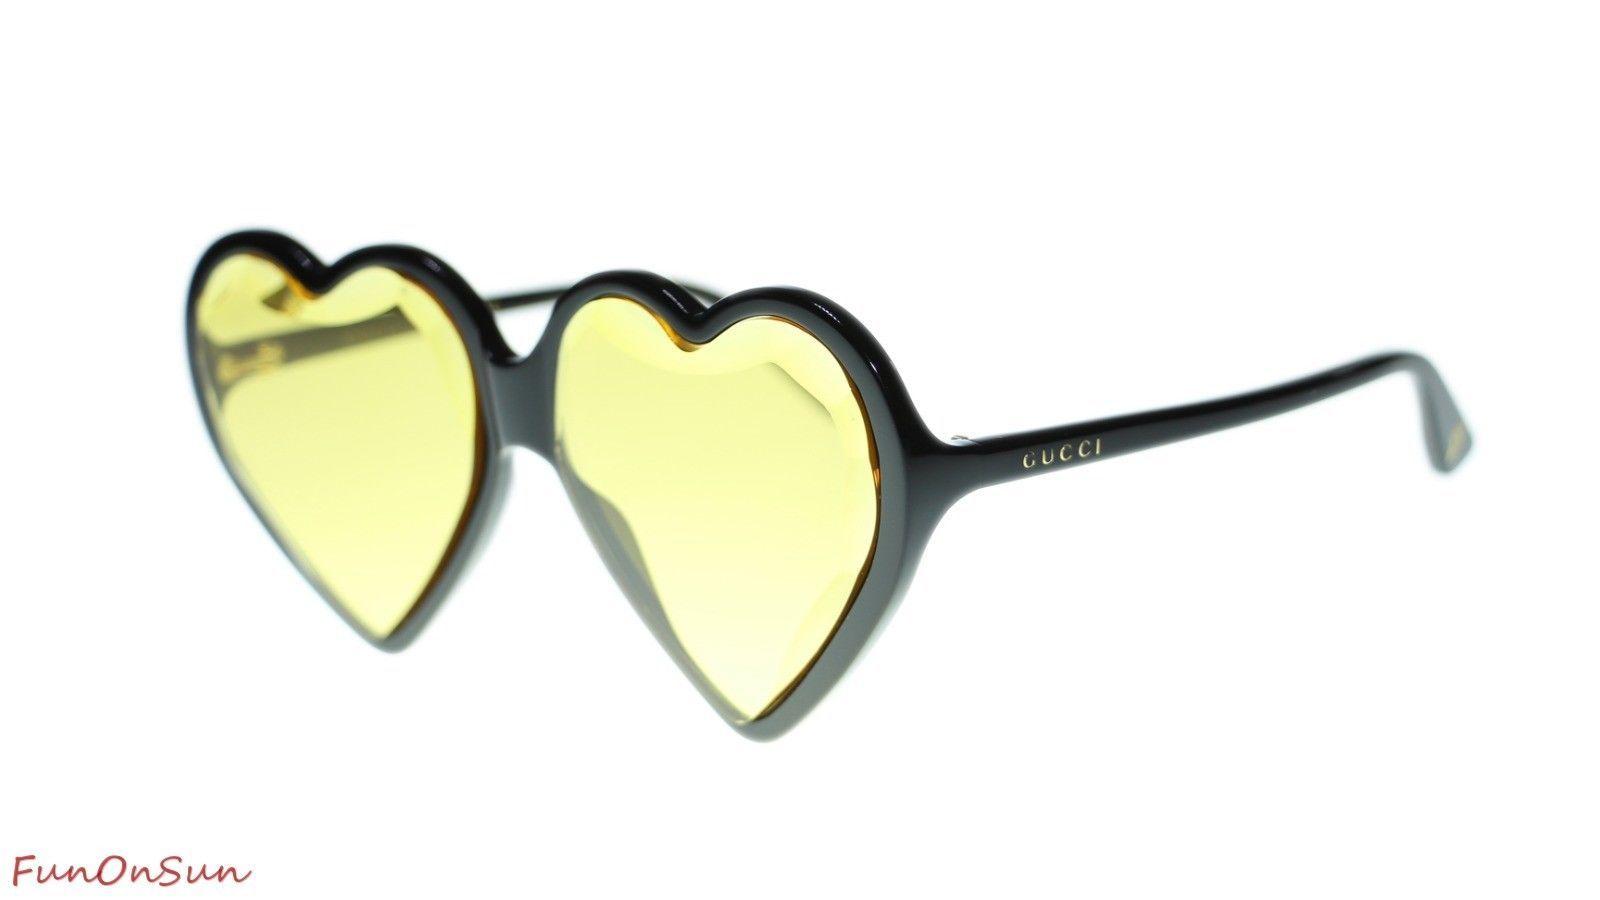 3e808ab9aa0 10. 10. Previous. Gucci Women Heart Sunglasses GG0360S 002 Black Yellow Lens  60mm. Gucci Women Heart Sunglasses ...